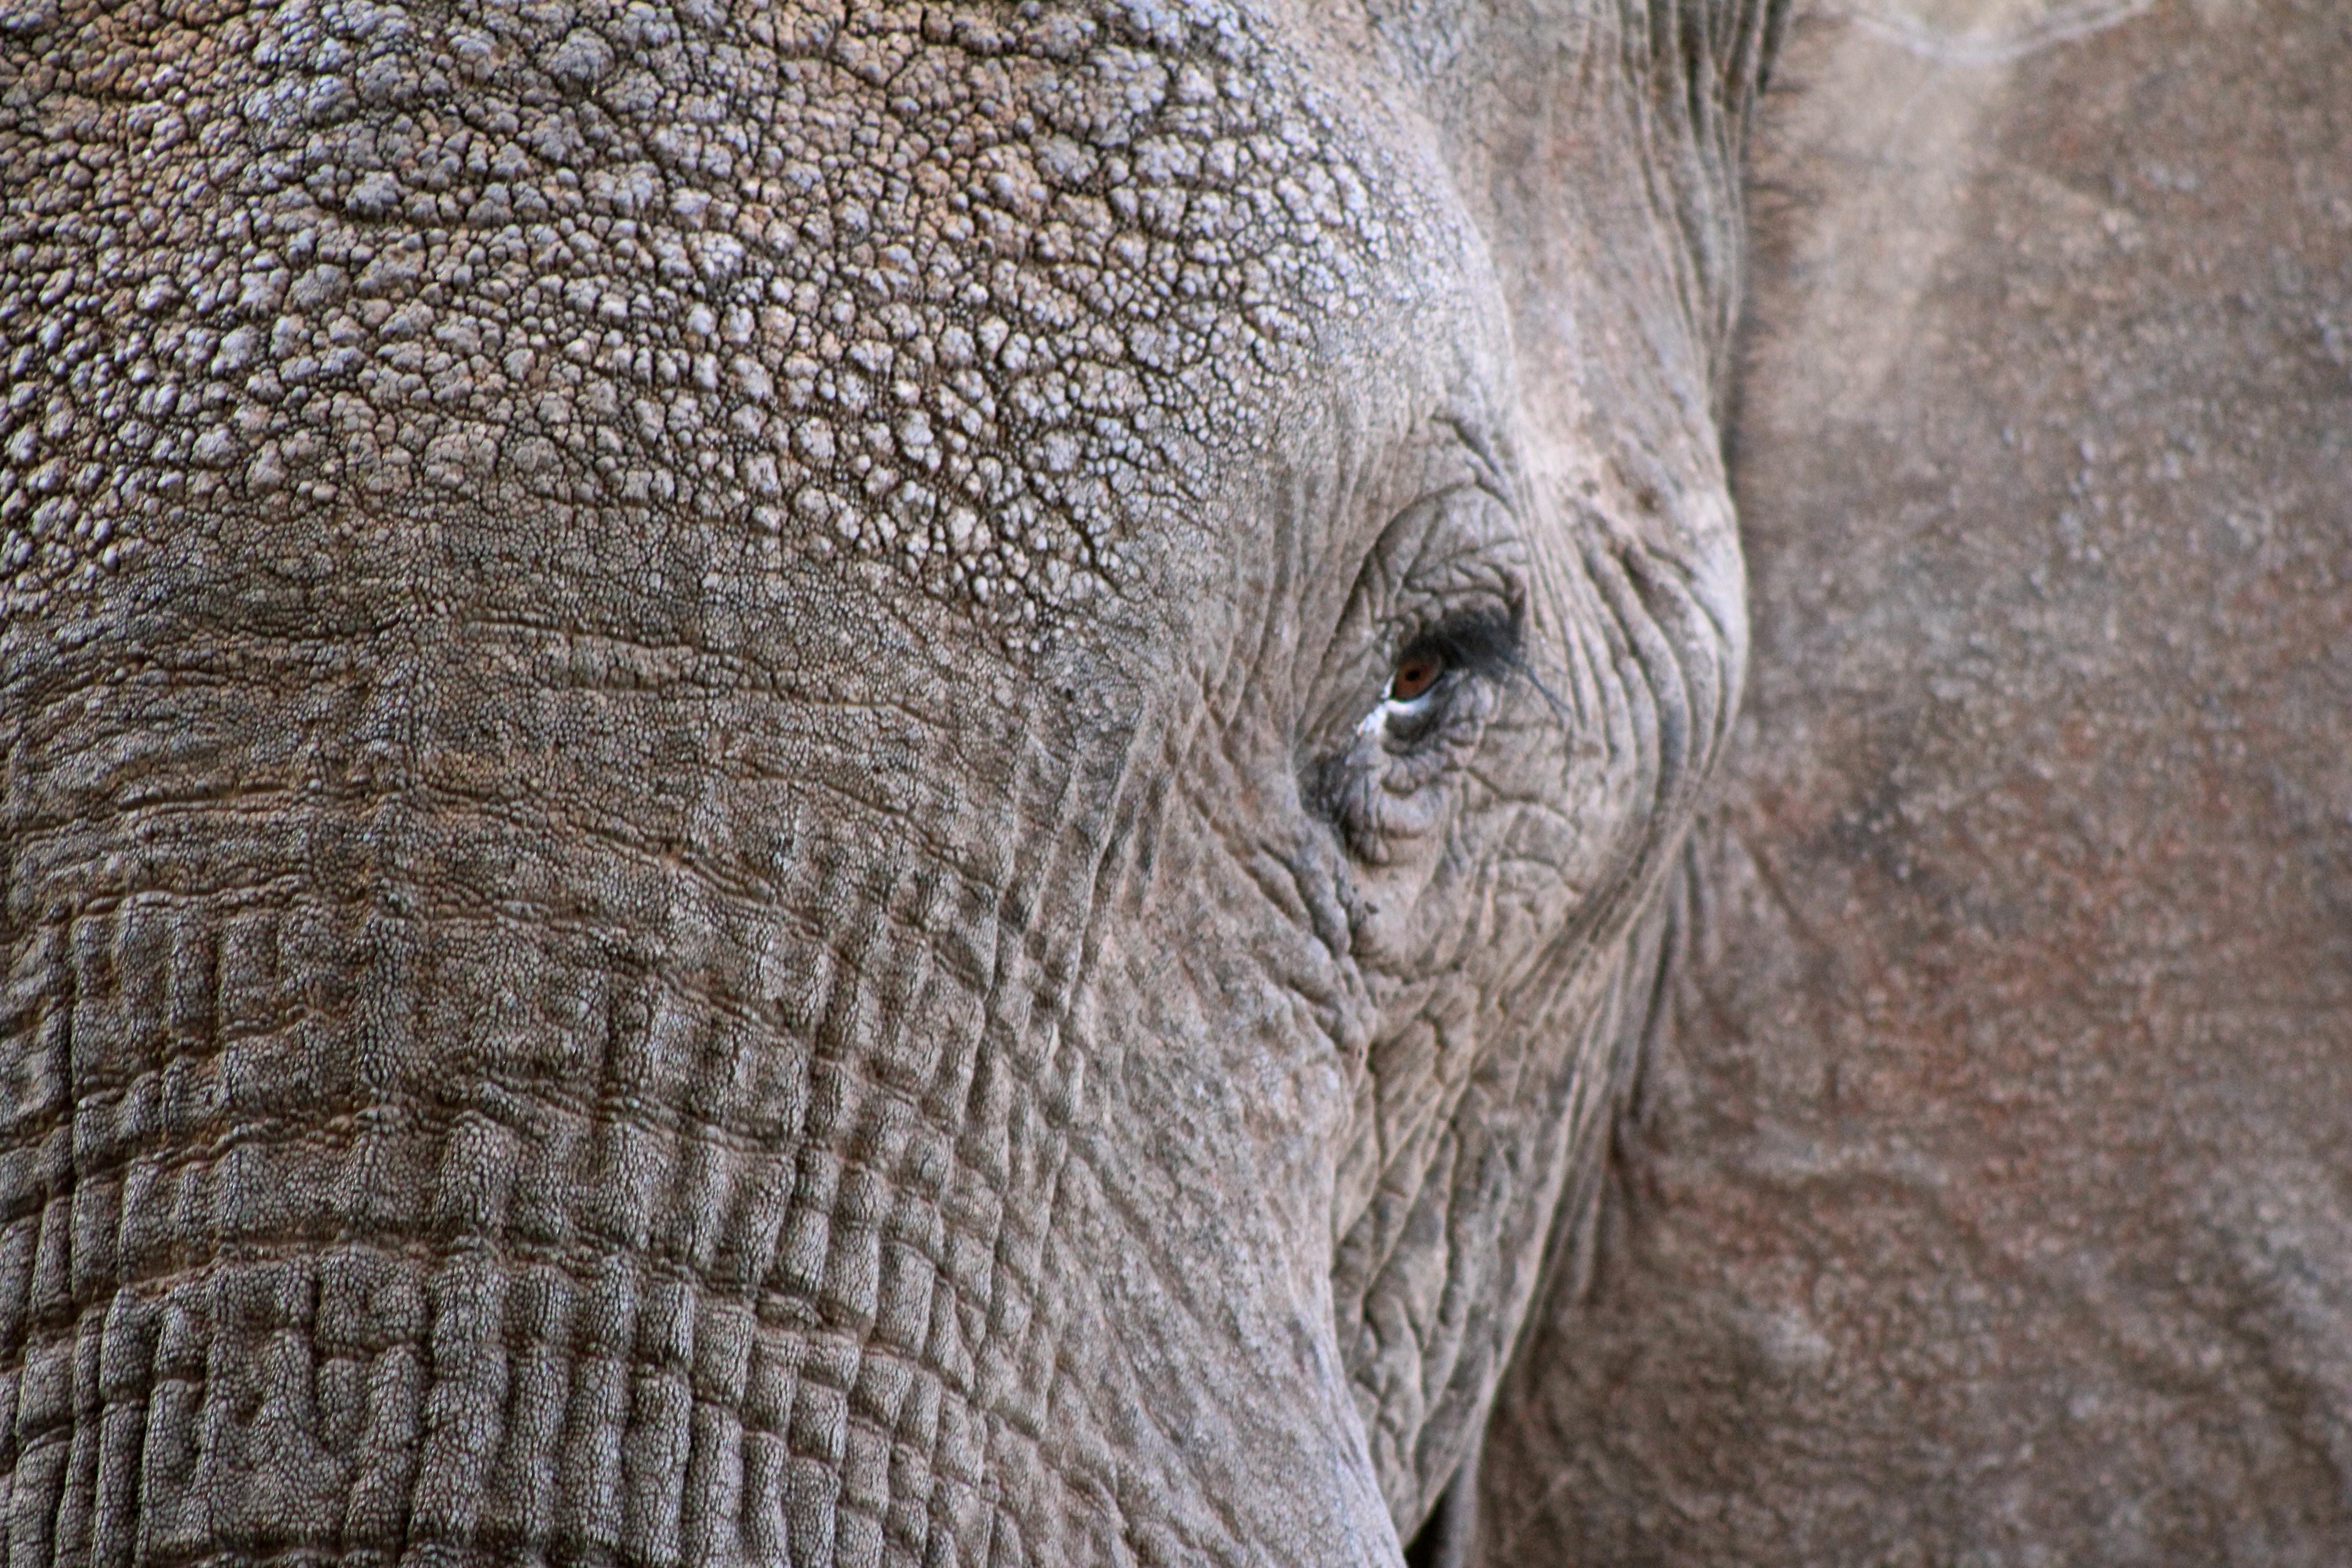 closeup photo of elephant face